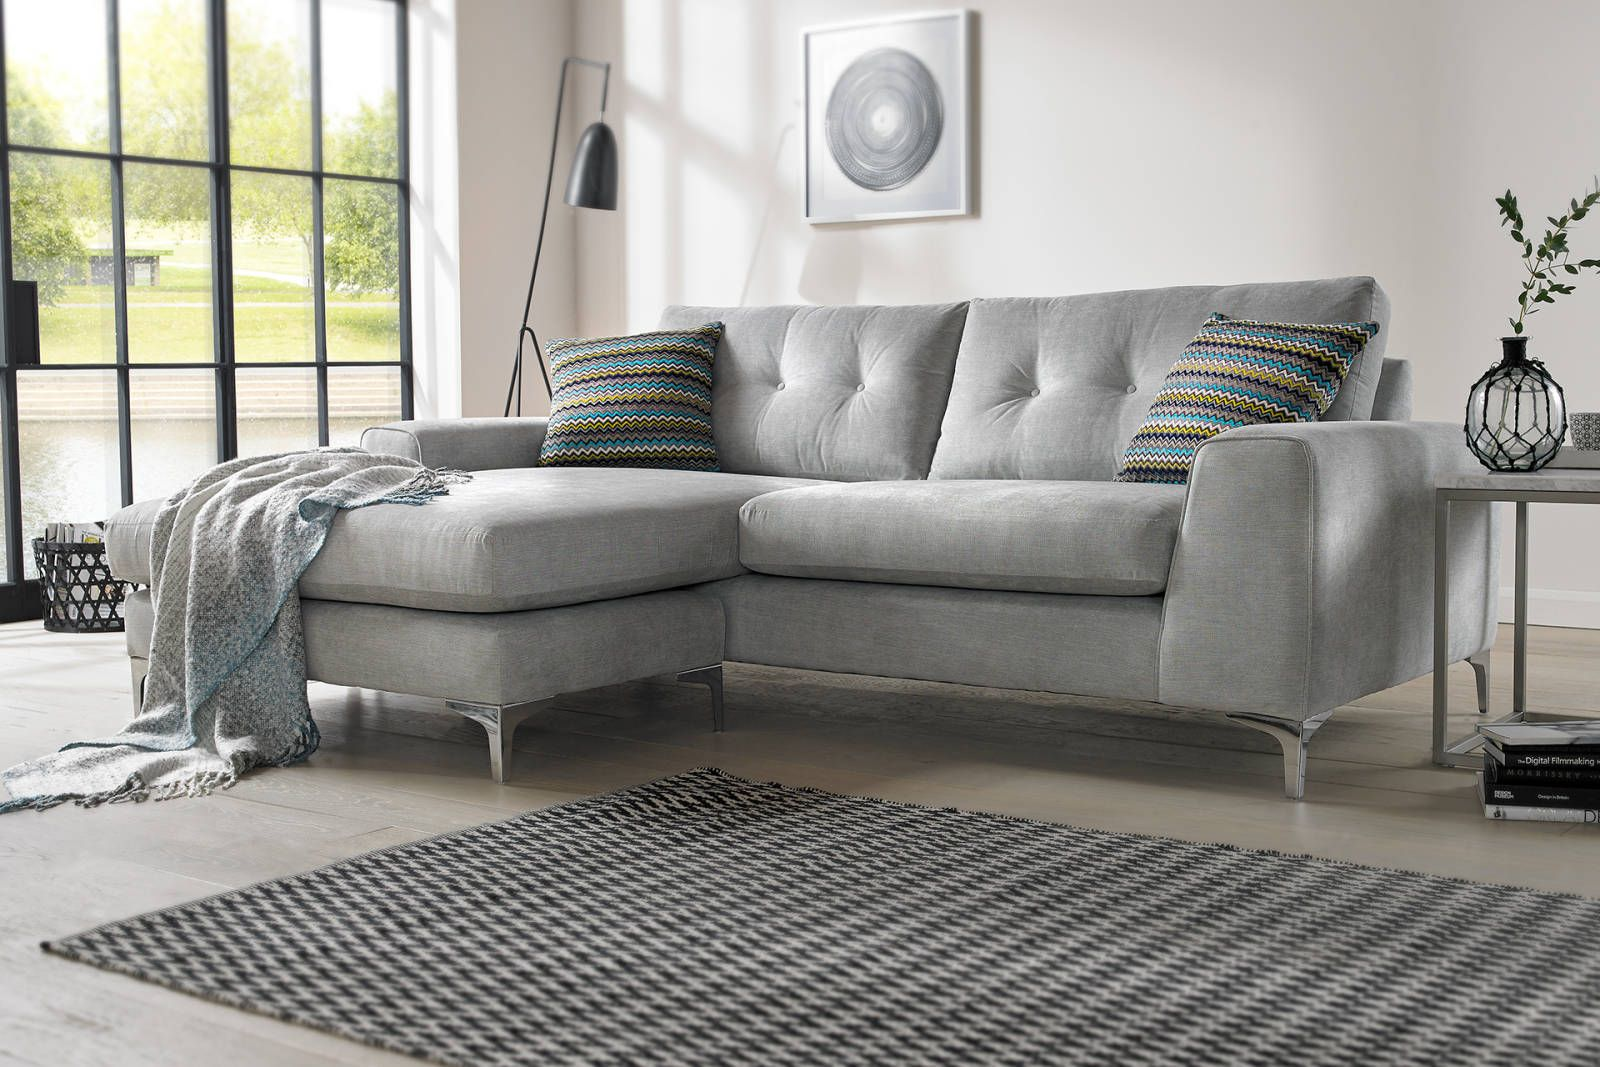 Demure Sofology Living Room Grey Home Decor Sofa